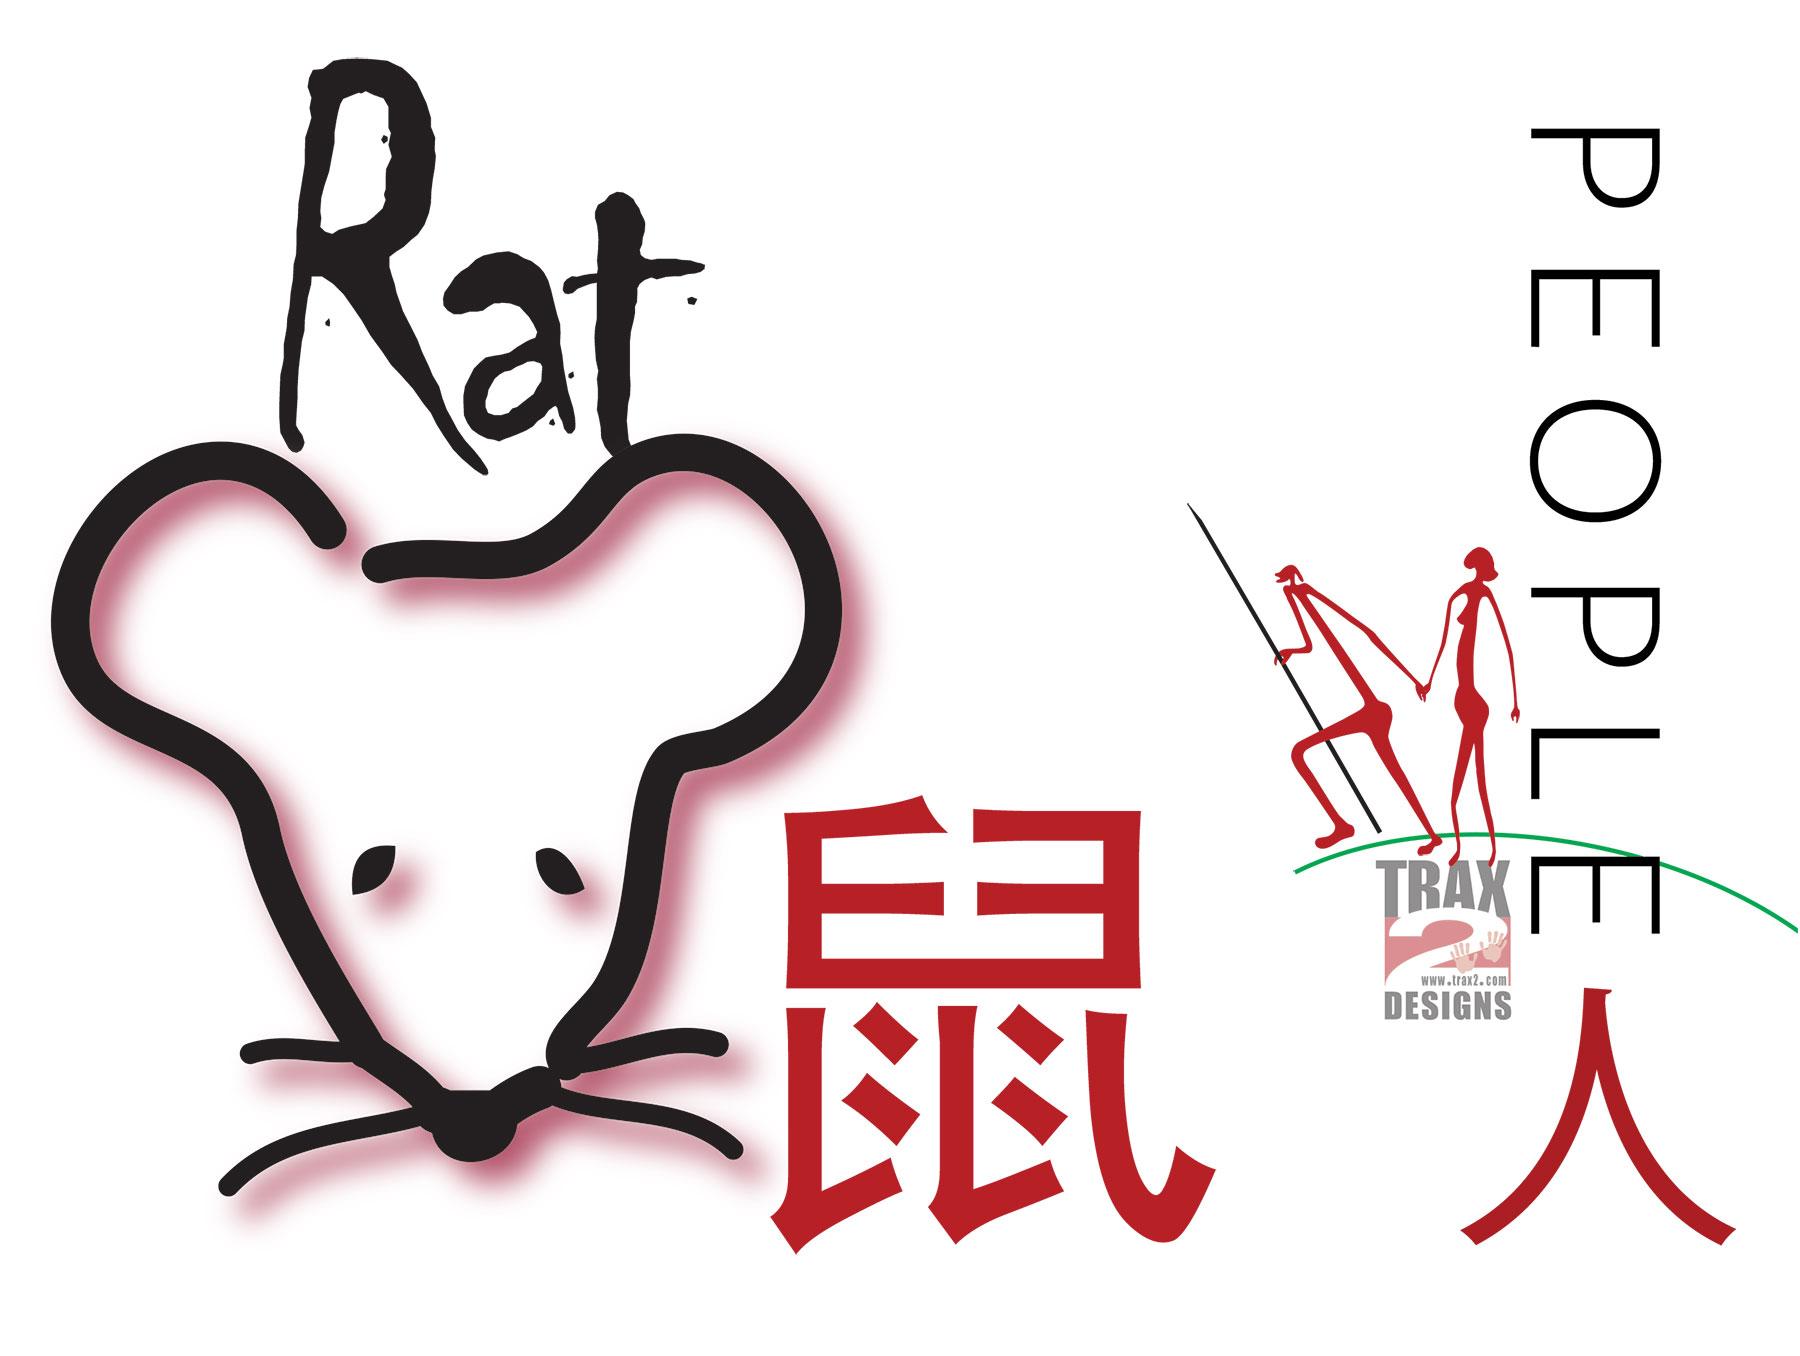 Rat People